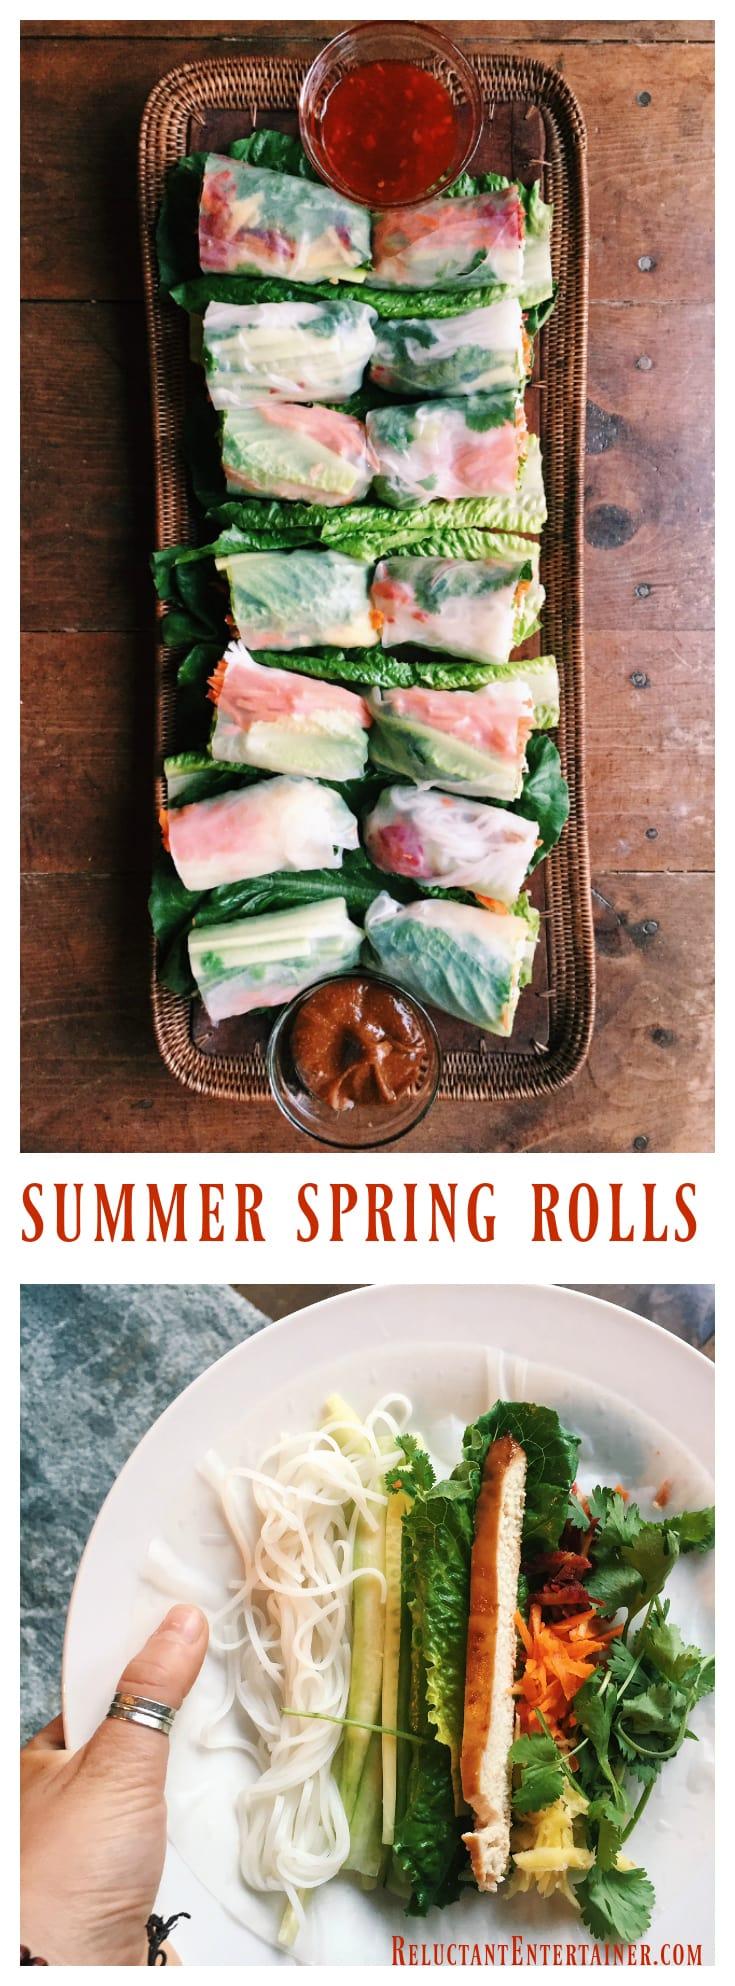 Summer Spring Rolls at ReluctantEntertainer.com